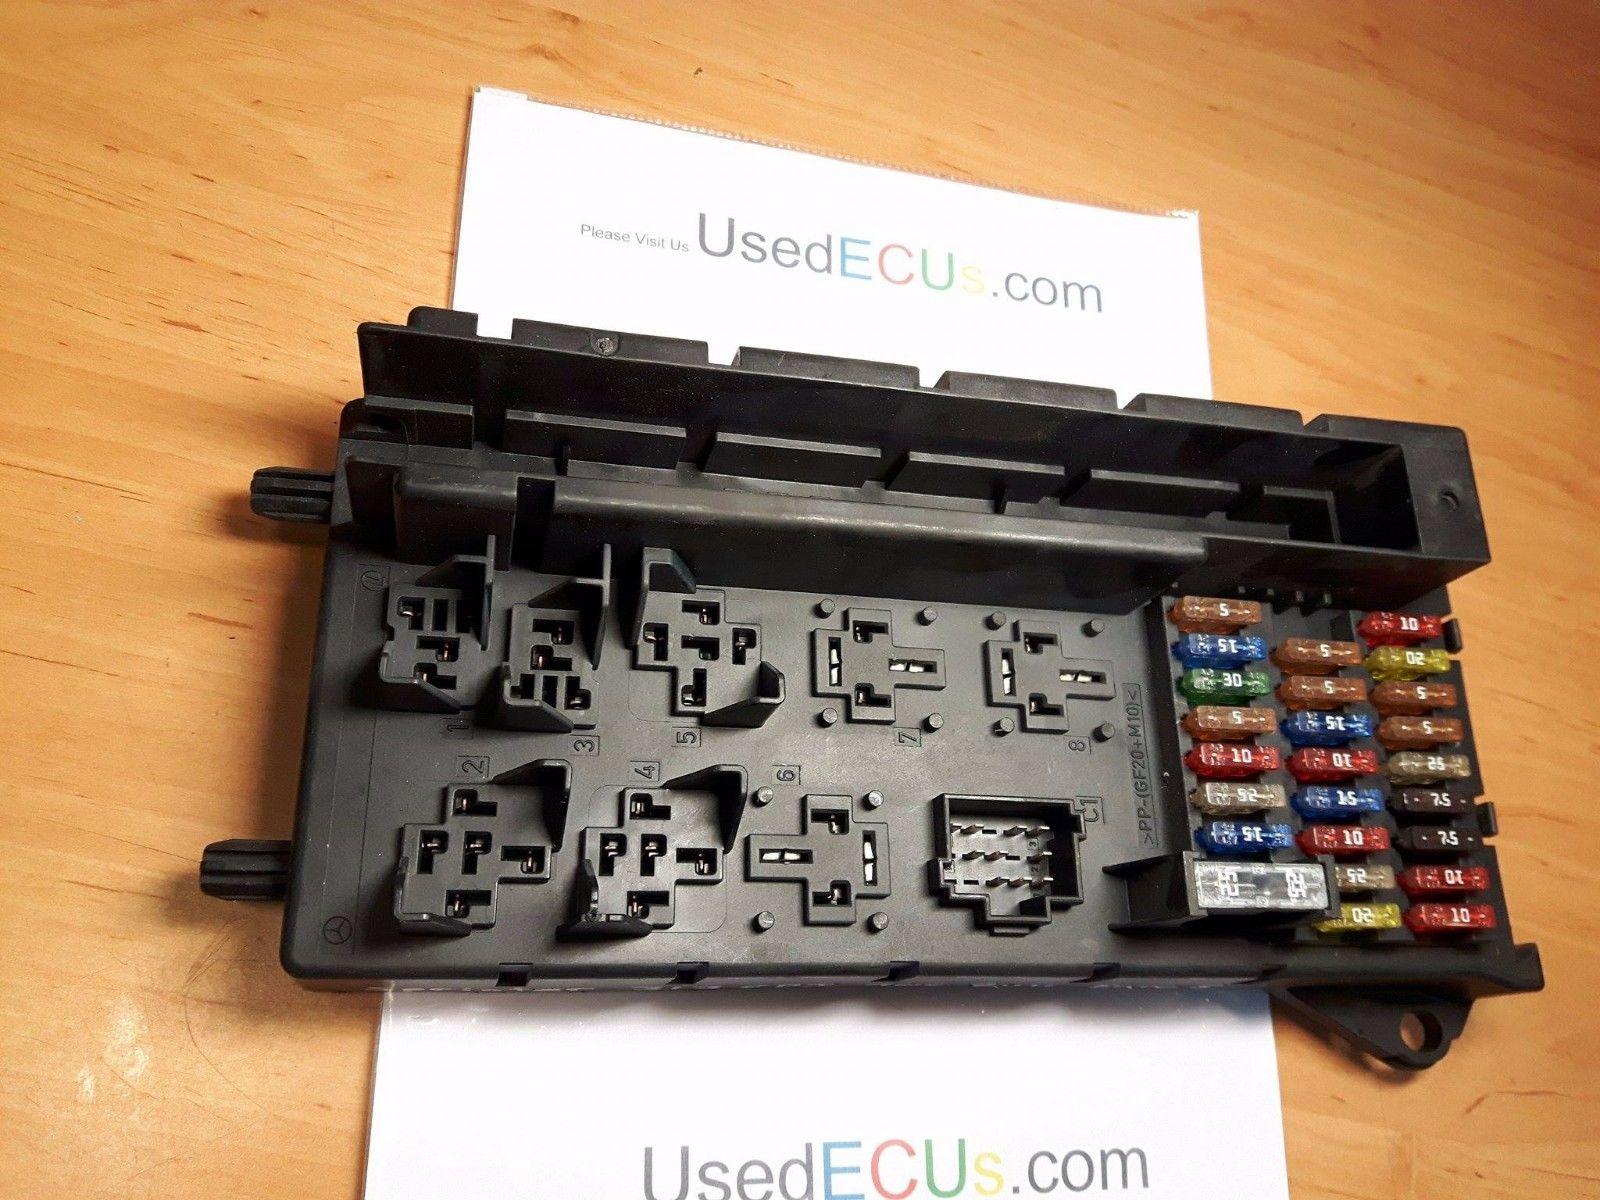 Sprinter Fuse Box Electrical Wiring Diagrams 2005 Dodge Mercedes Relay Ecu A9065454301 5b0uj0107 04